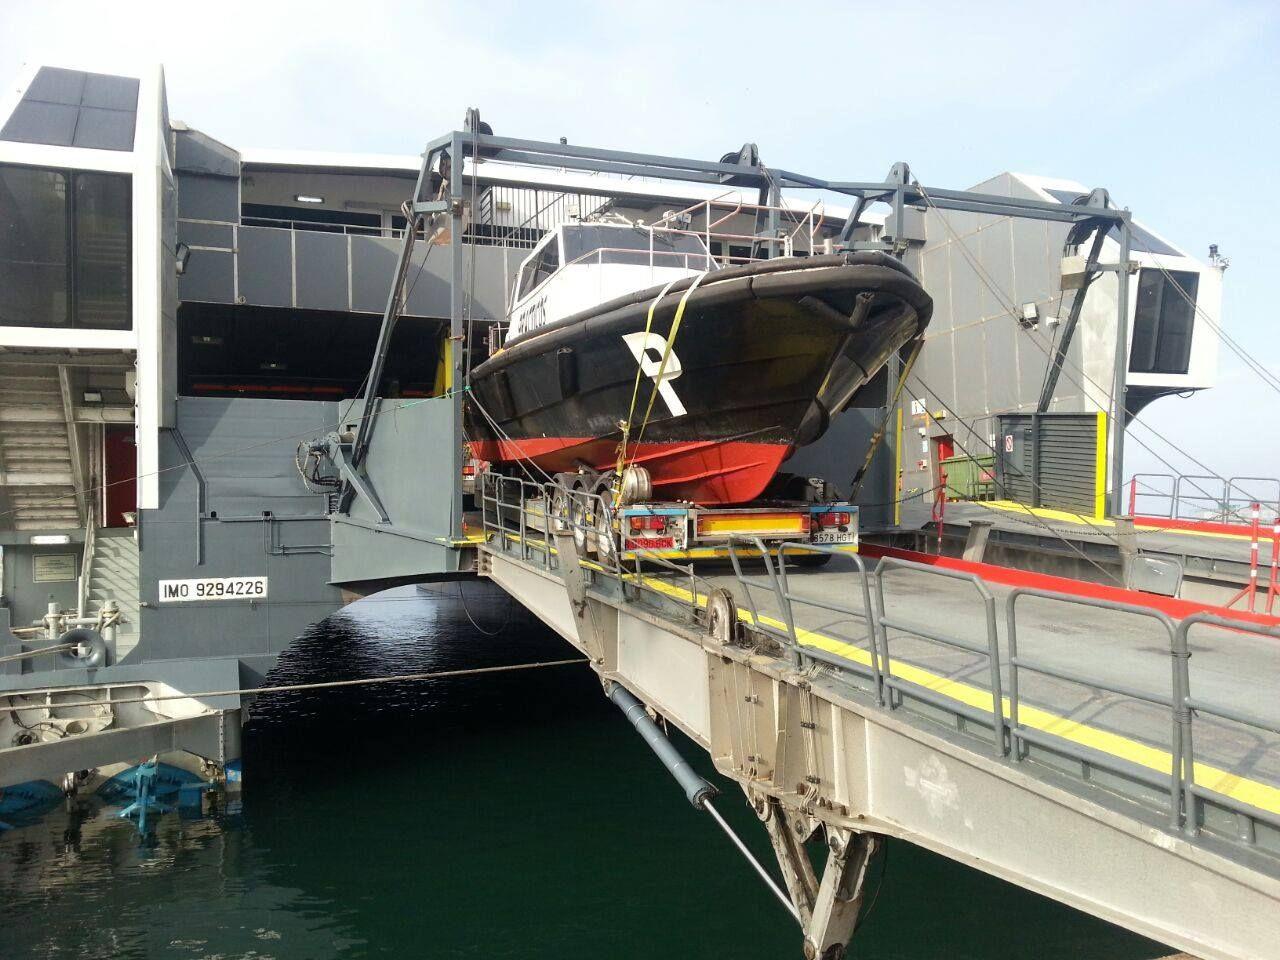 Ttransporte de embarcaciones por carretera a nivel nacional, internacional